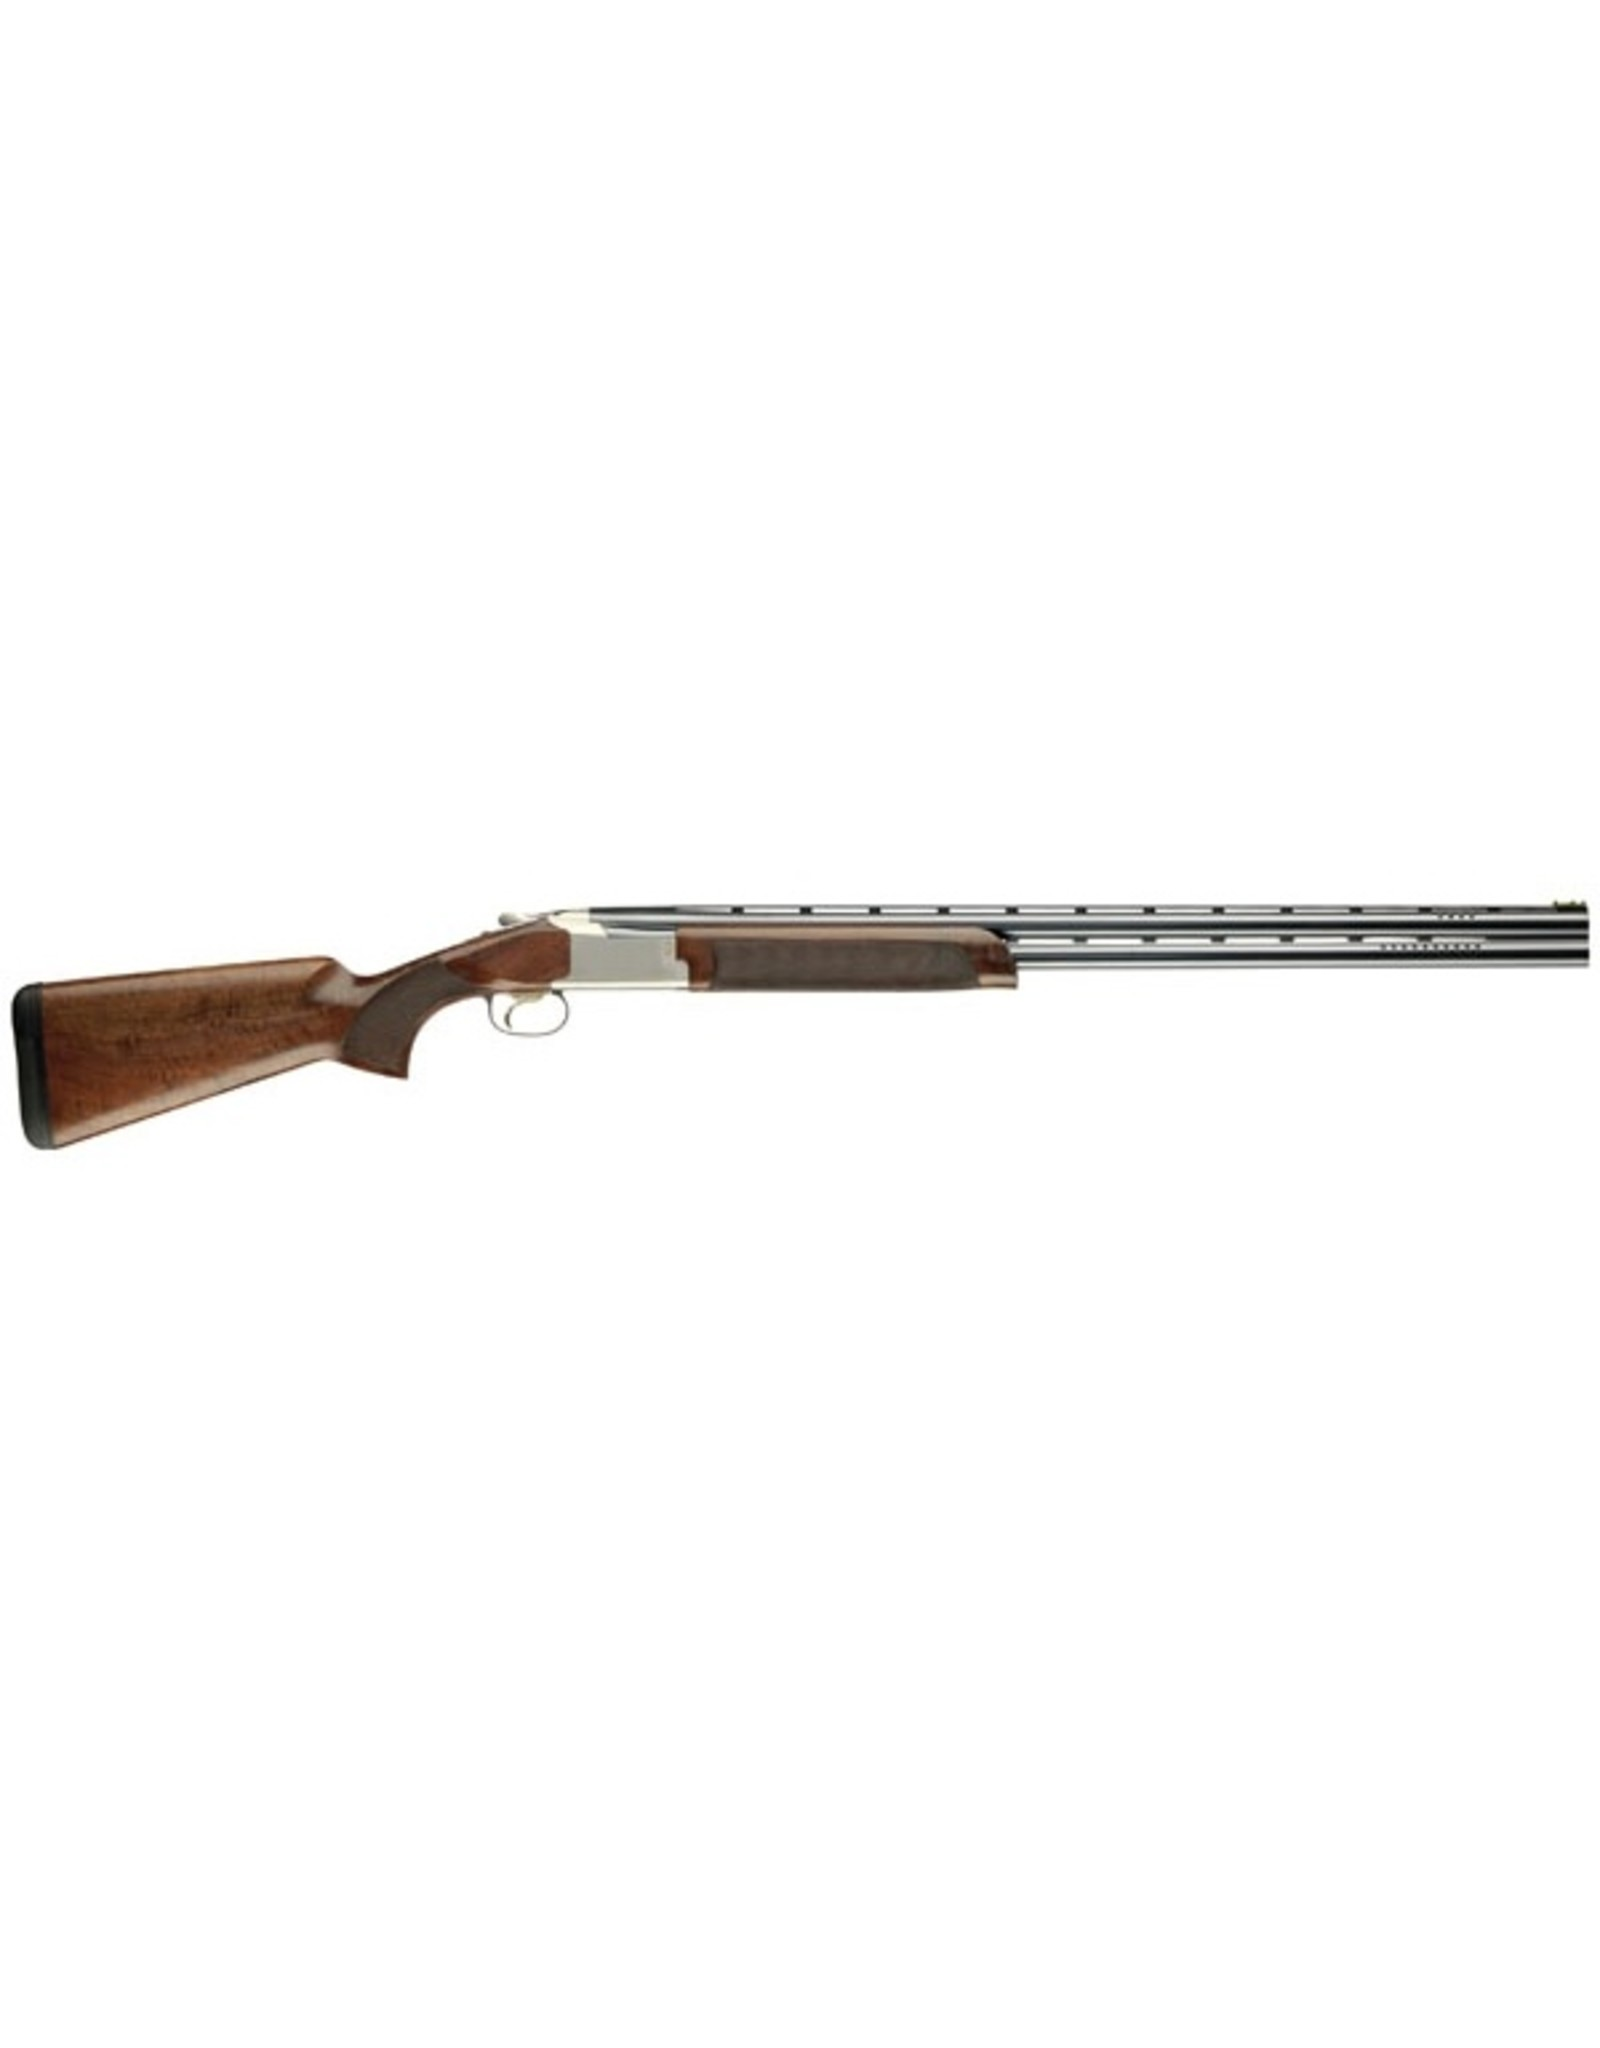 "Browning Browning Citori 725 Sptg 12 ga 32"" bbl Walnut Stock"